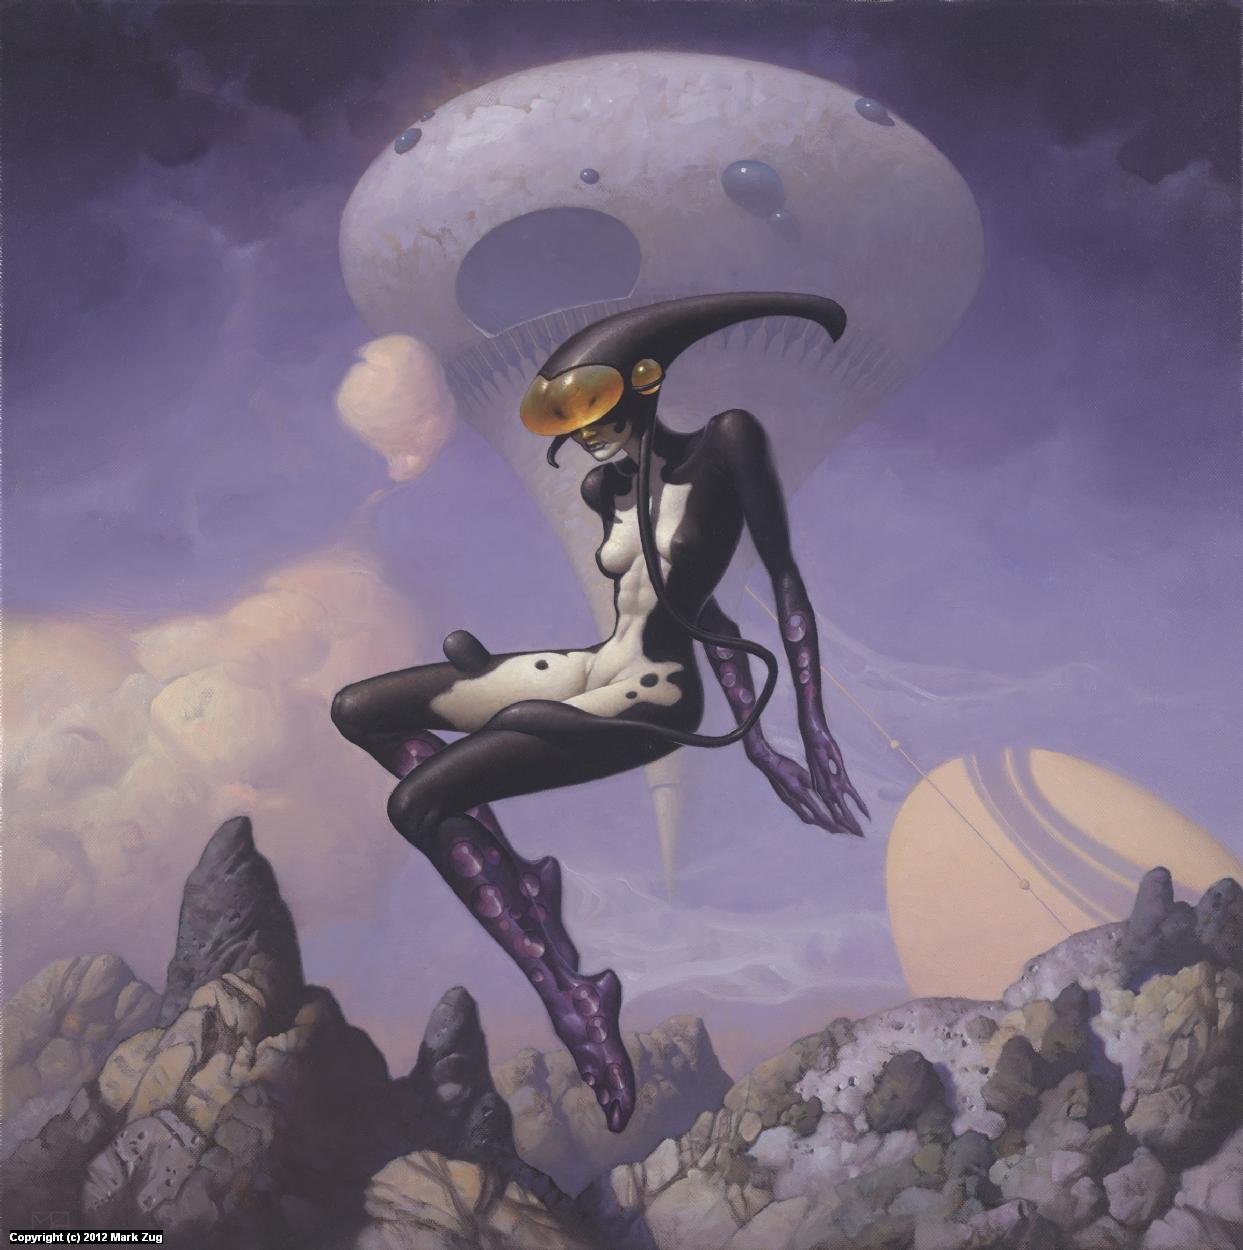 Xenon Artwork by Mark Zug